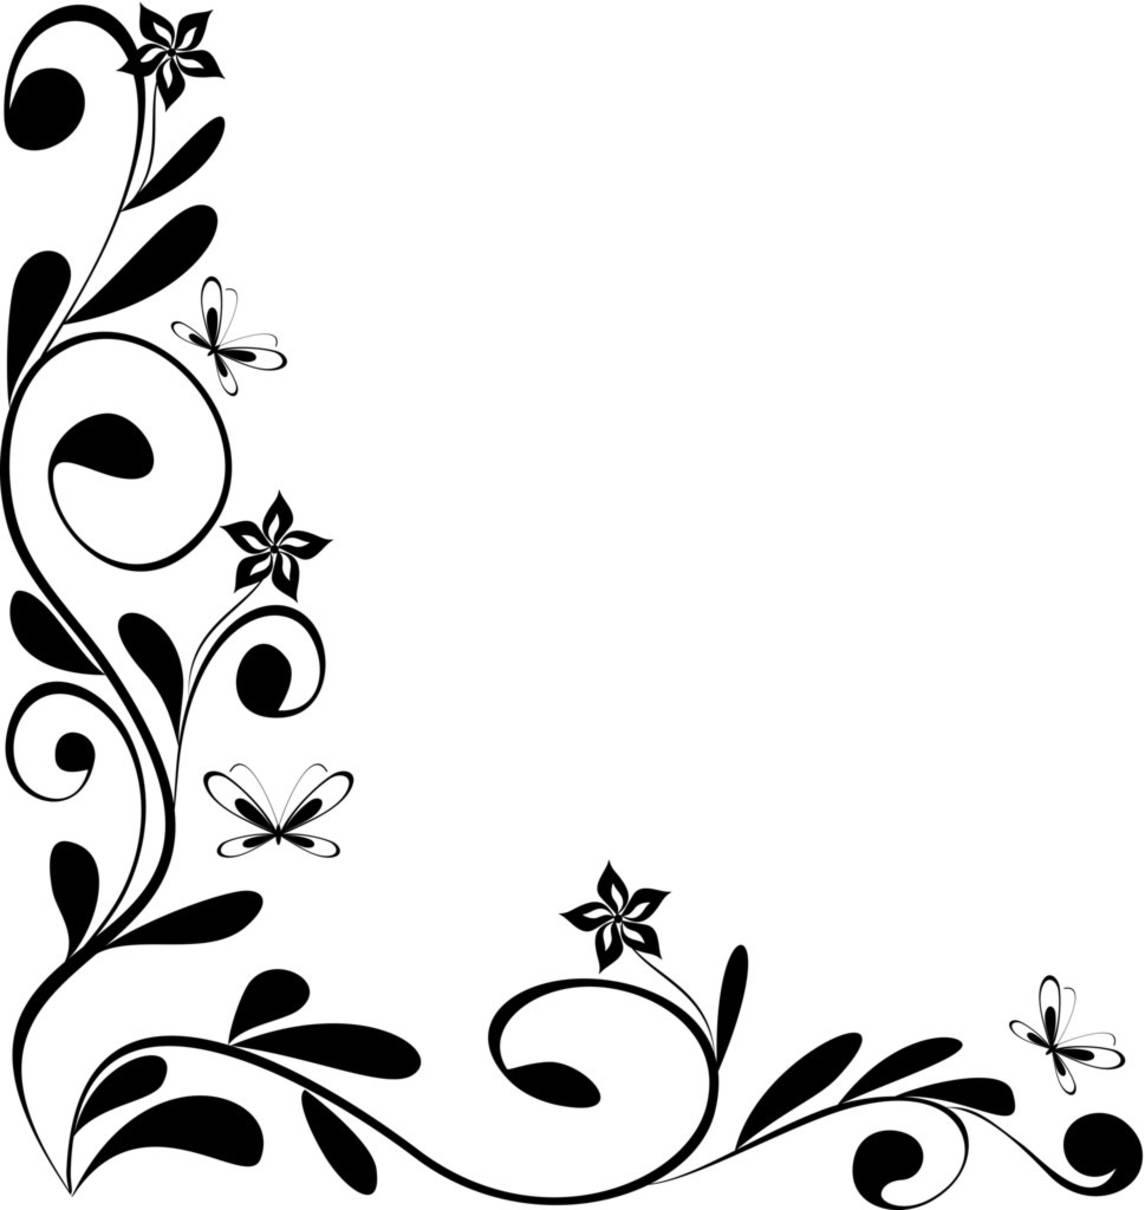 Free Flower Border Line Design Download Free Clip Art